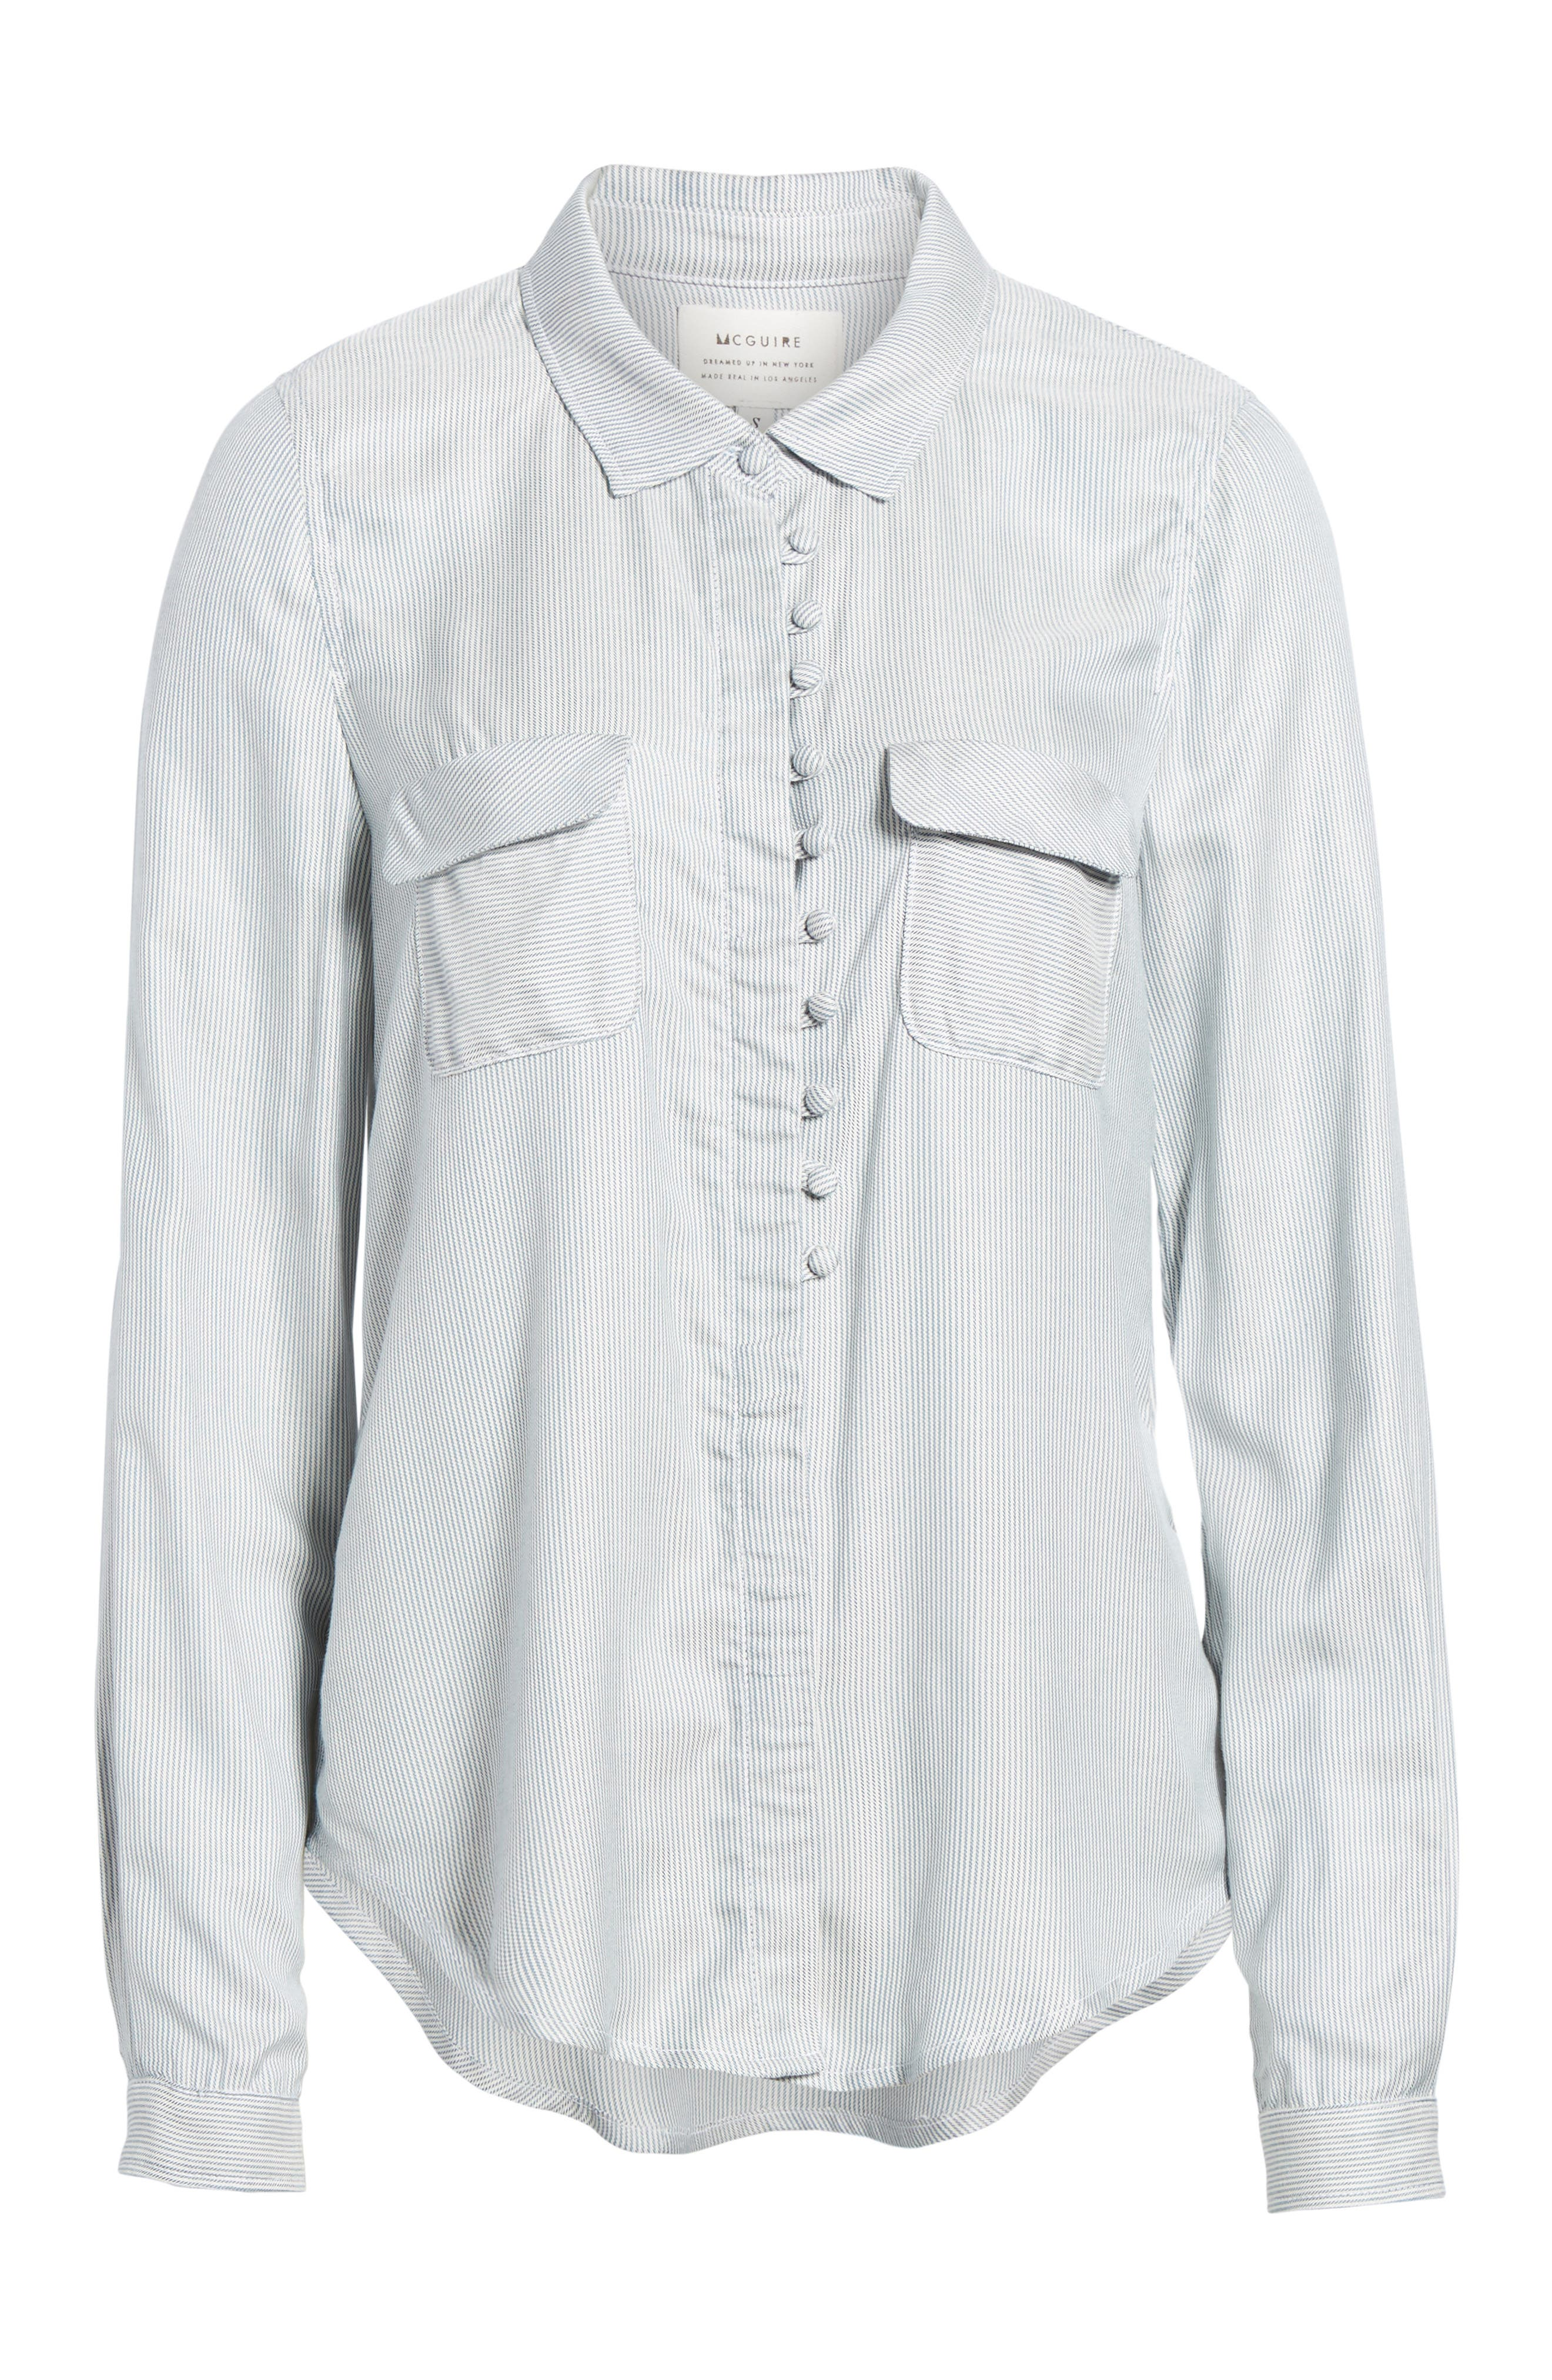 Berea Shirt,                             Alternate thumbnail 6, color,                             450